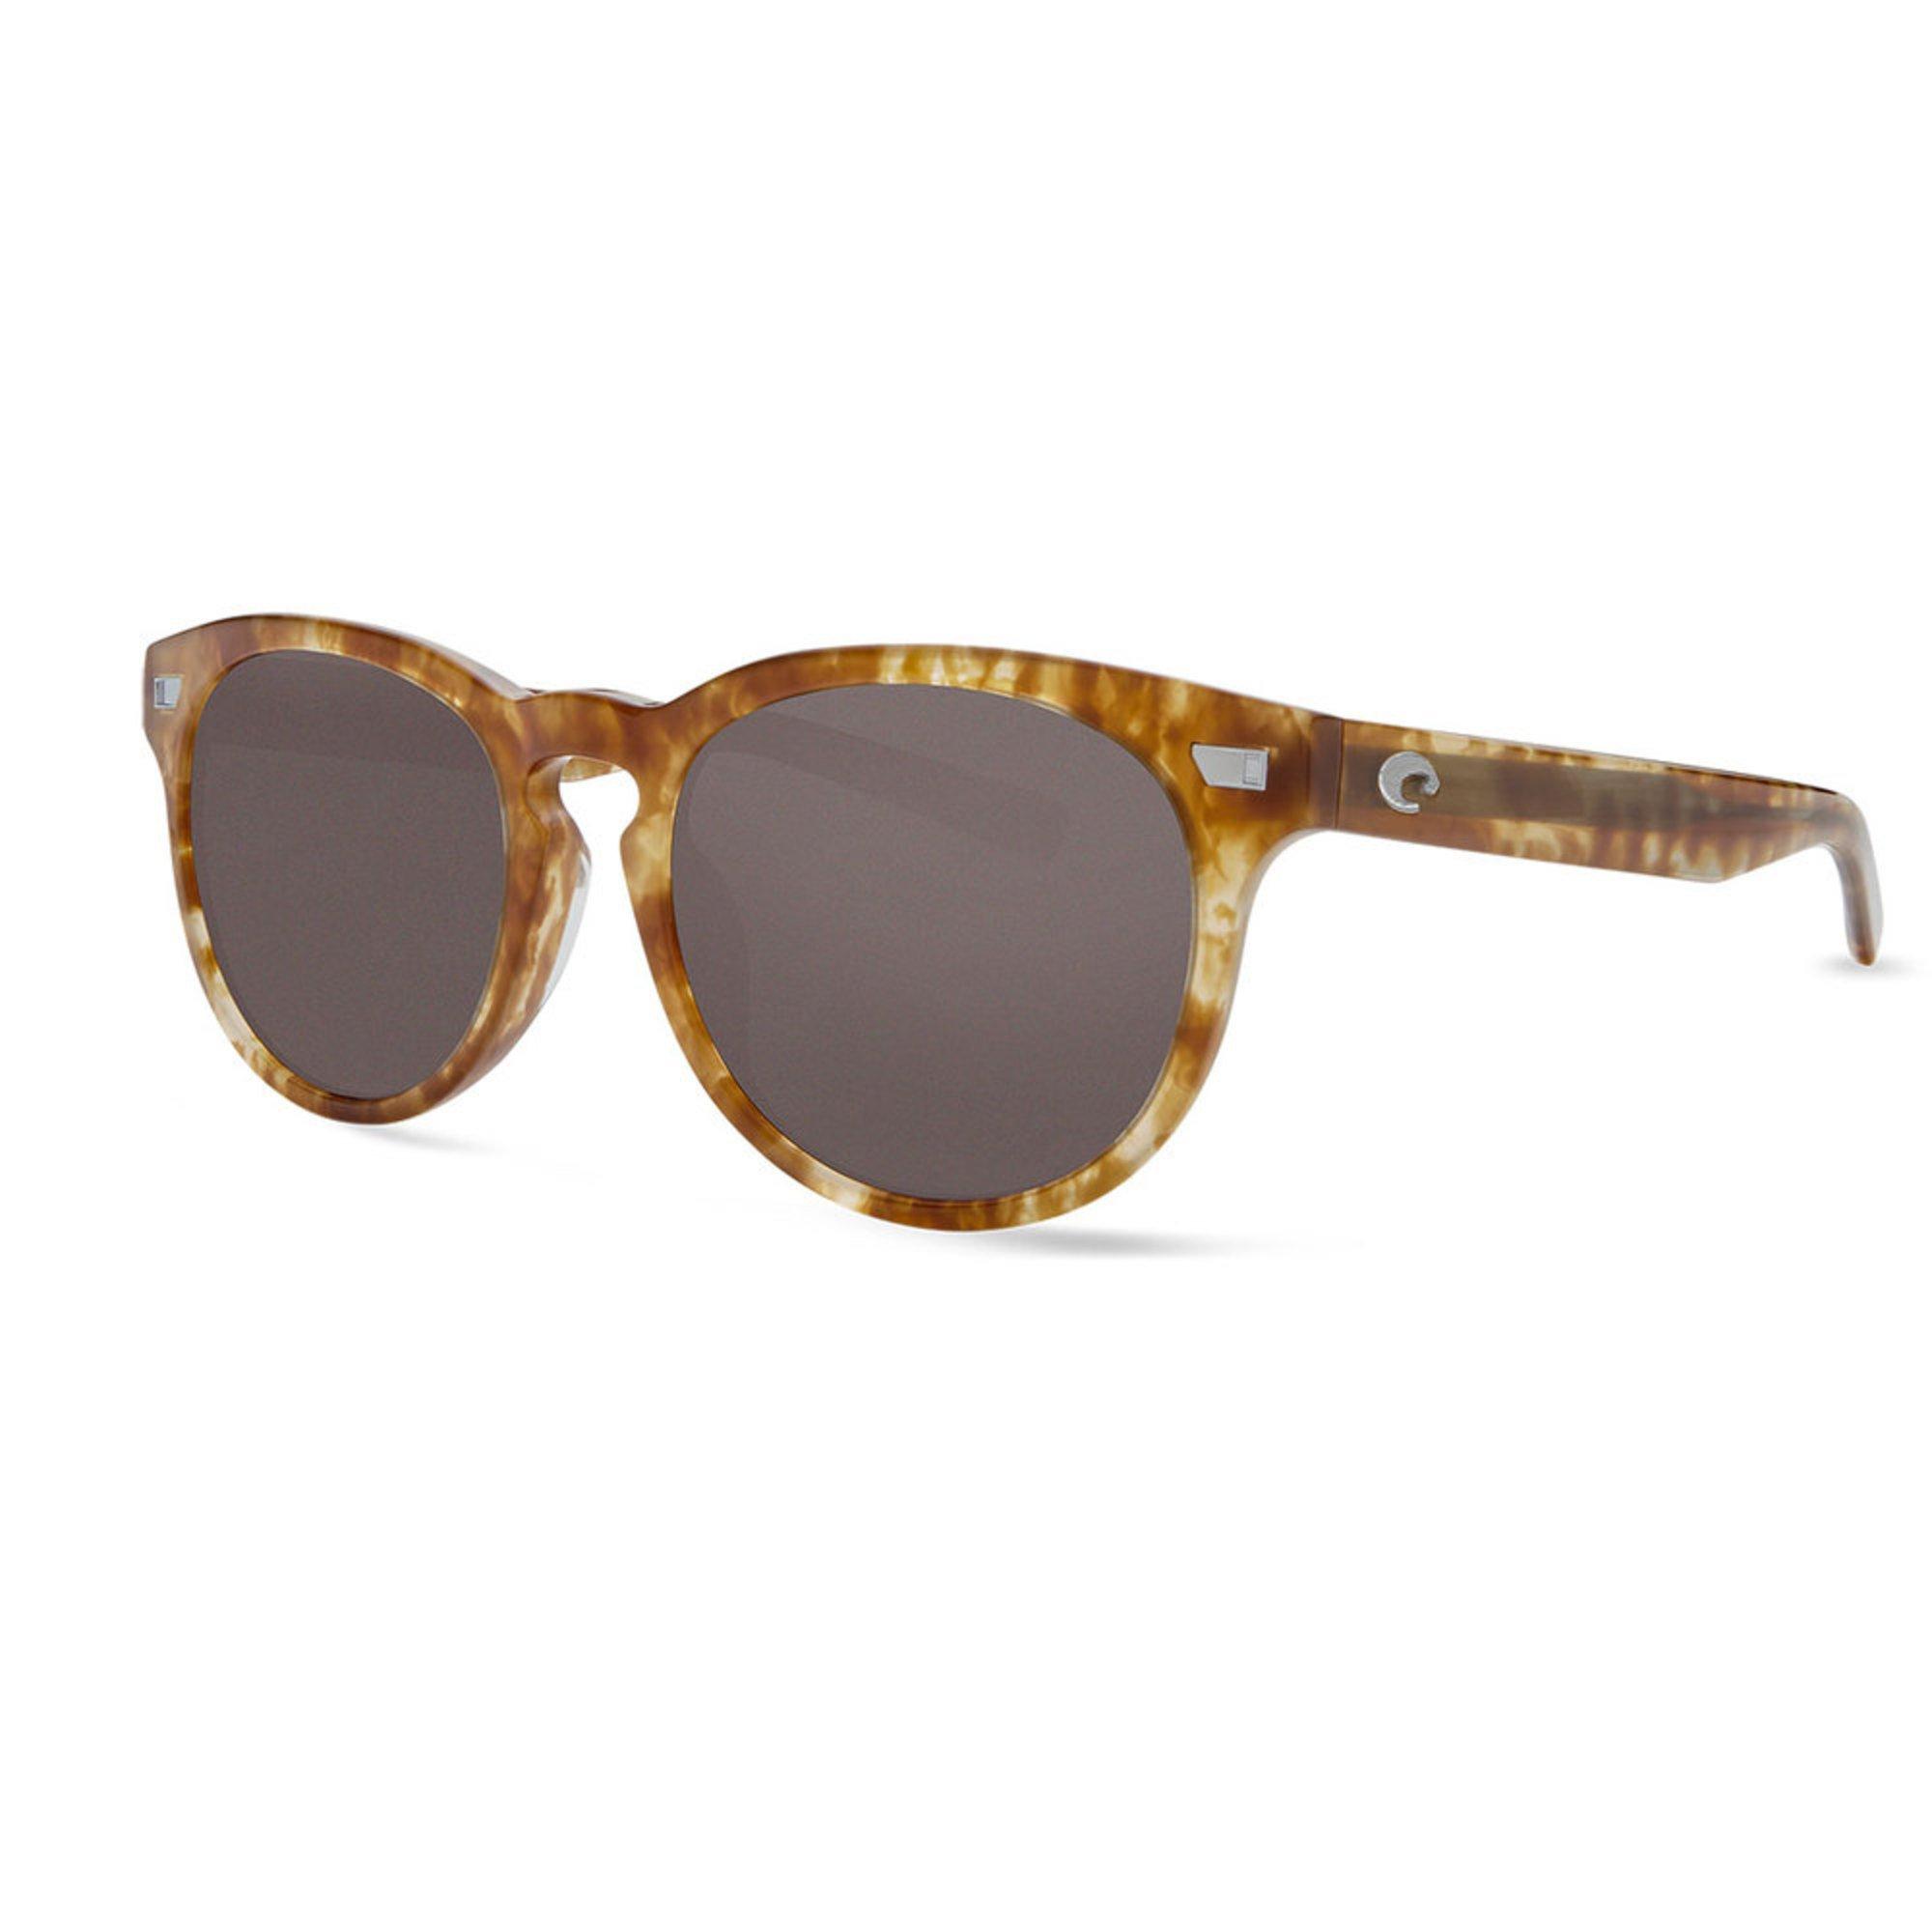 408345a01ce55 Costa Del Mar Unisex Gray Lens Shiny Kelp Frame Polarized Sunglasses 53mm